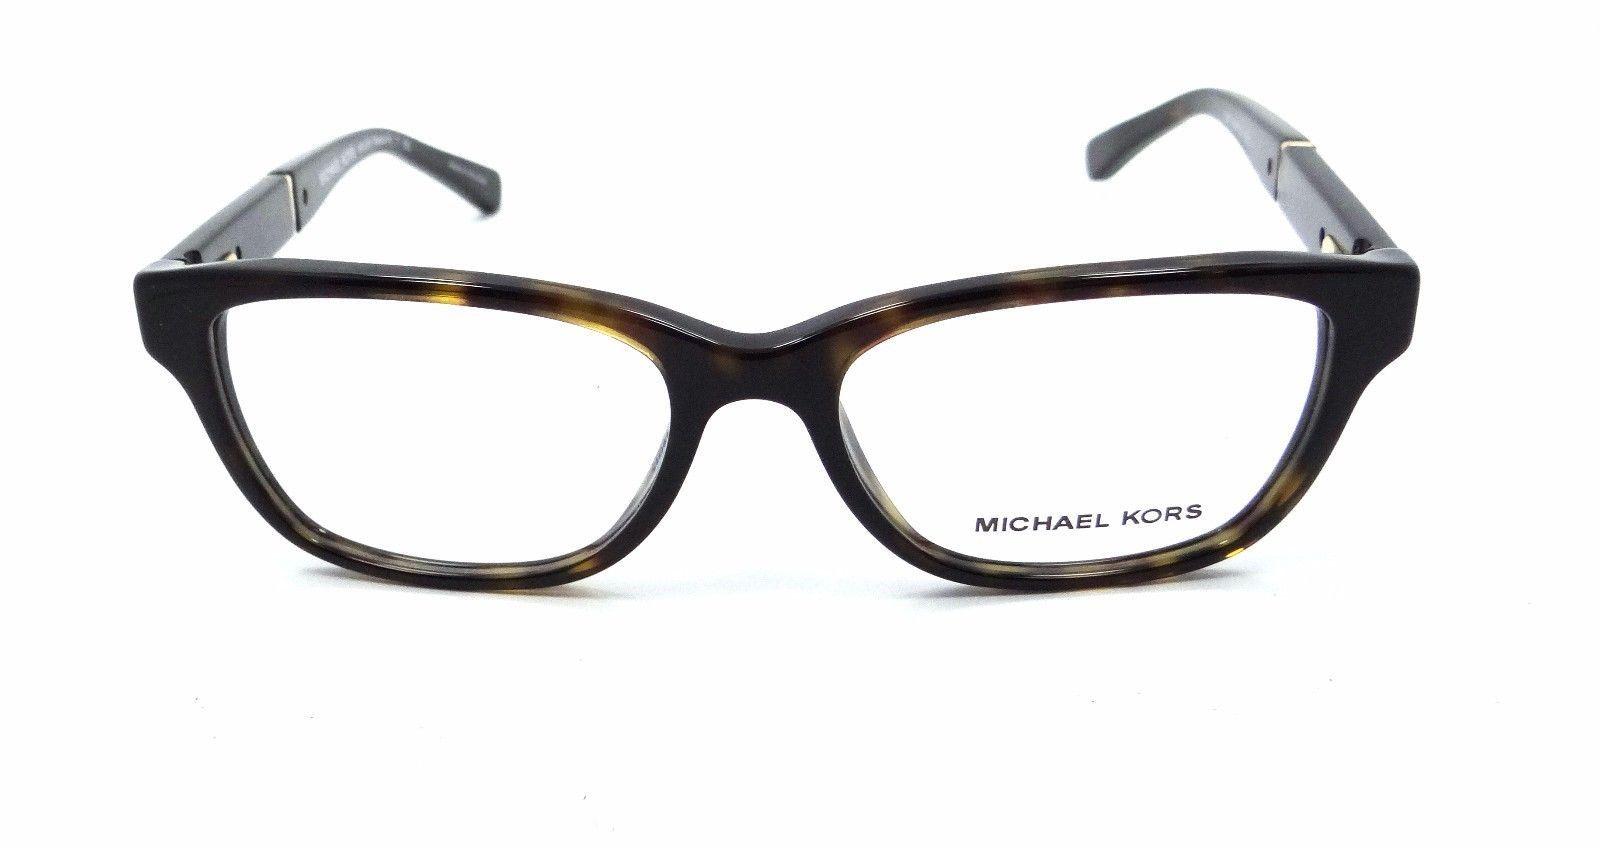 New Michael Kors Rx Eyeglasses Frames MK 4031 3180 Rania IV 49x15 Dark Tortoise